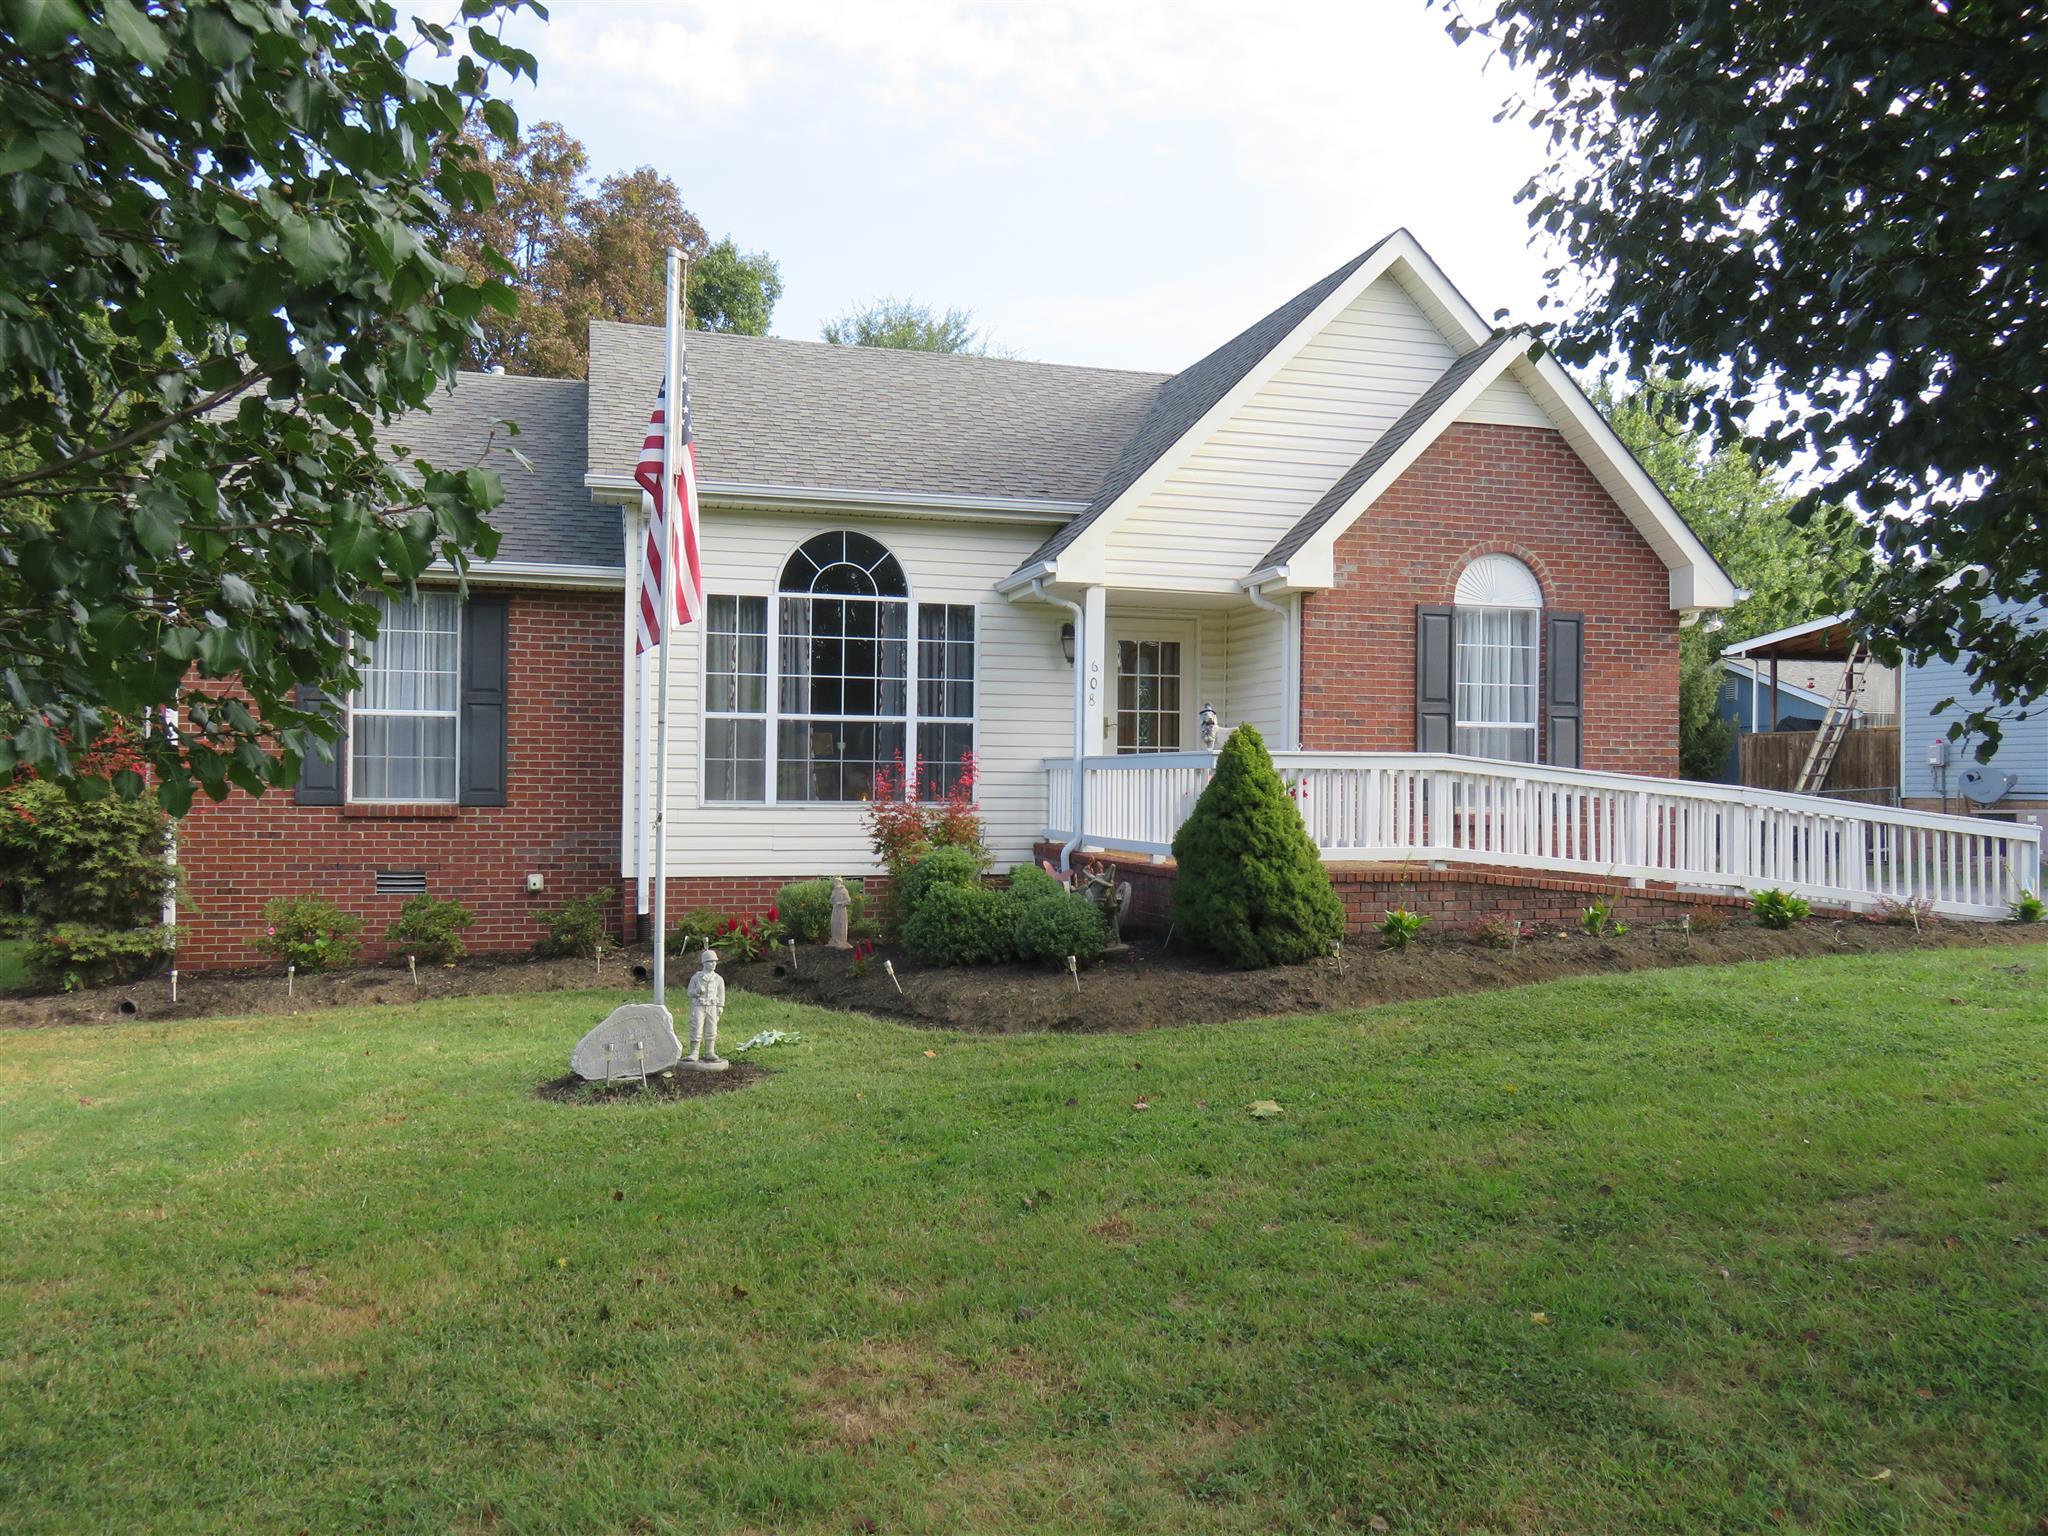 608 Highland Dr, White House, TN 37188